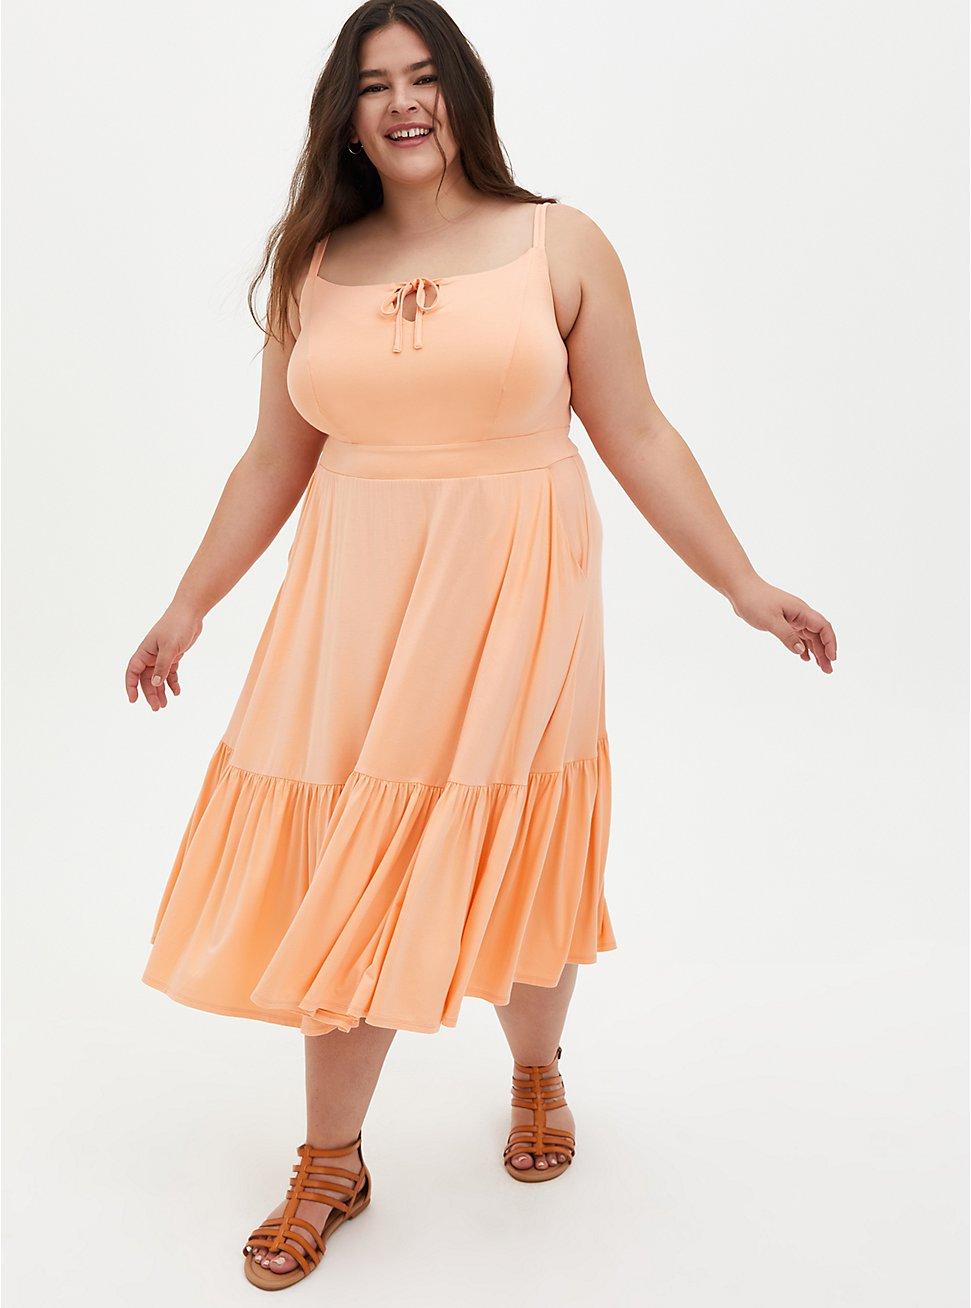 Super Soft Peach Tie-Front Tiered Midi Dress, PEACH NECTAR, hi-res